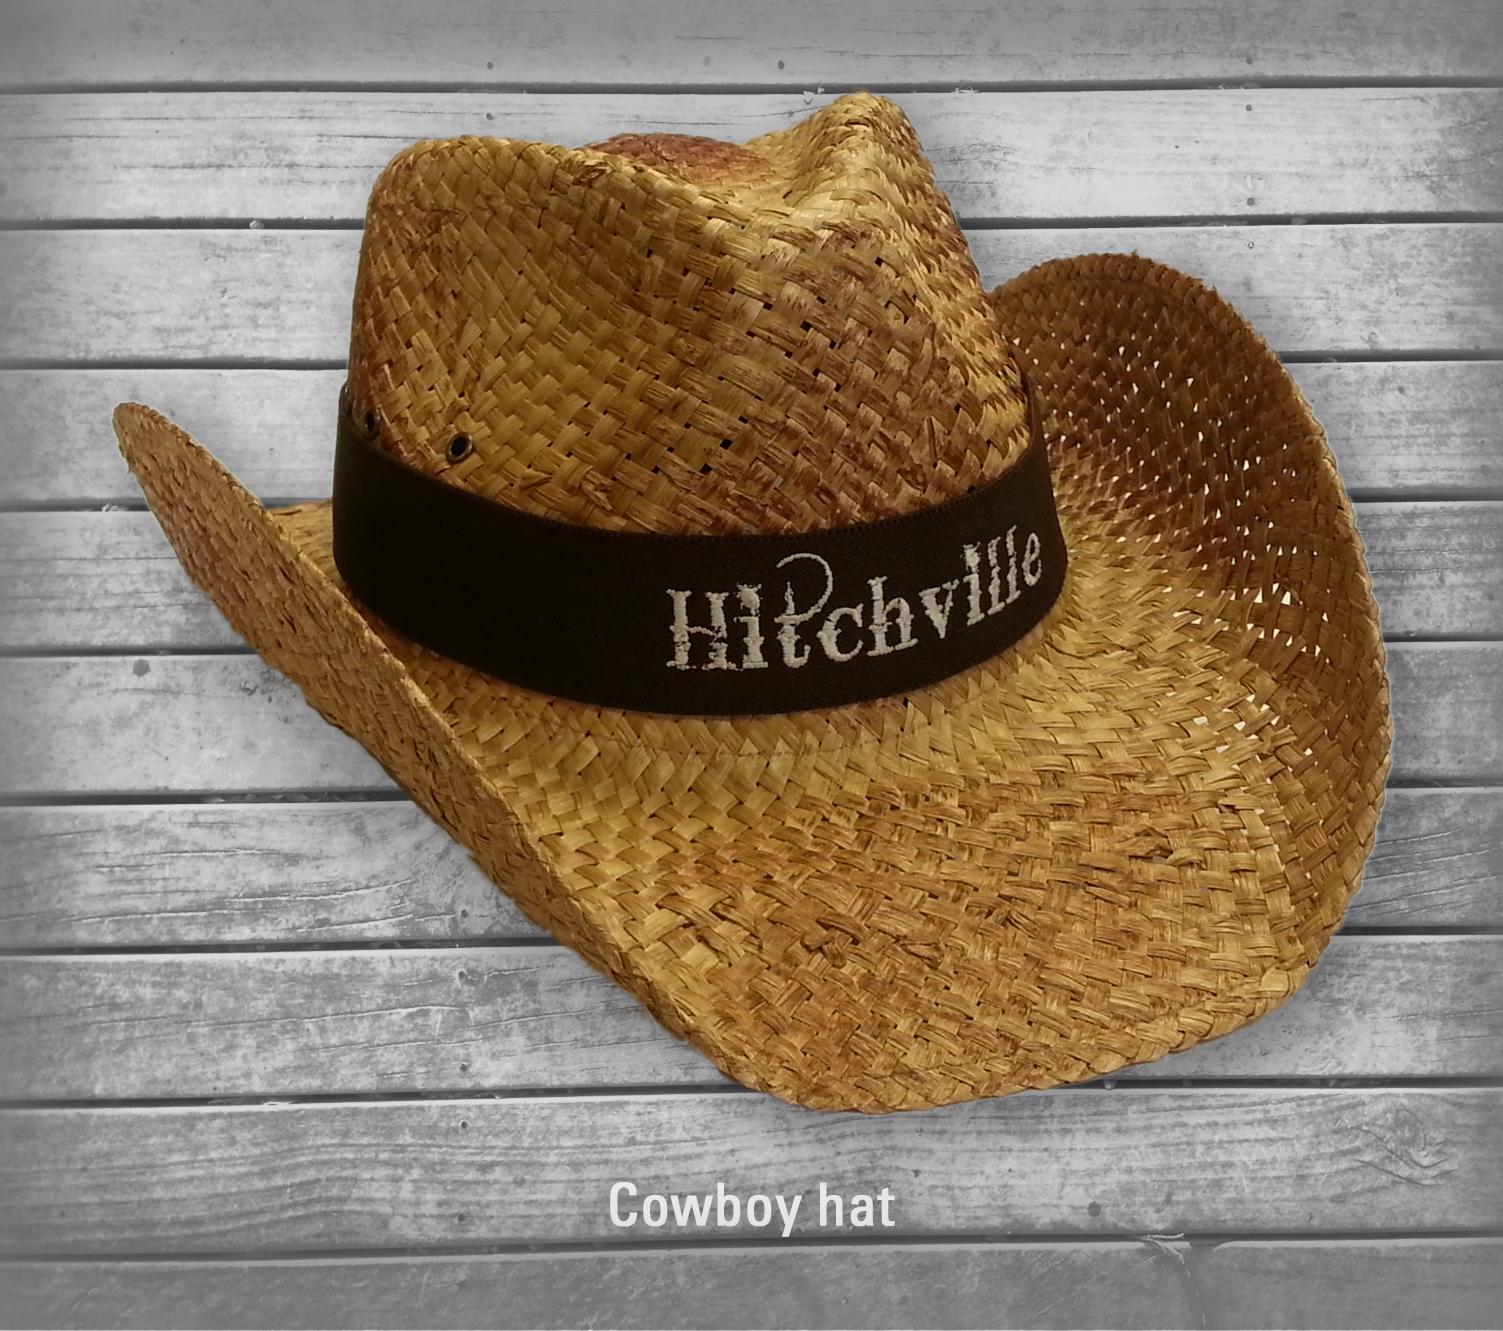 CowboyHat_Hitchville.jpg